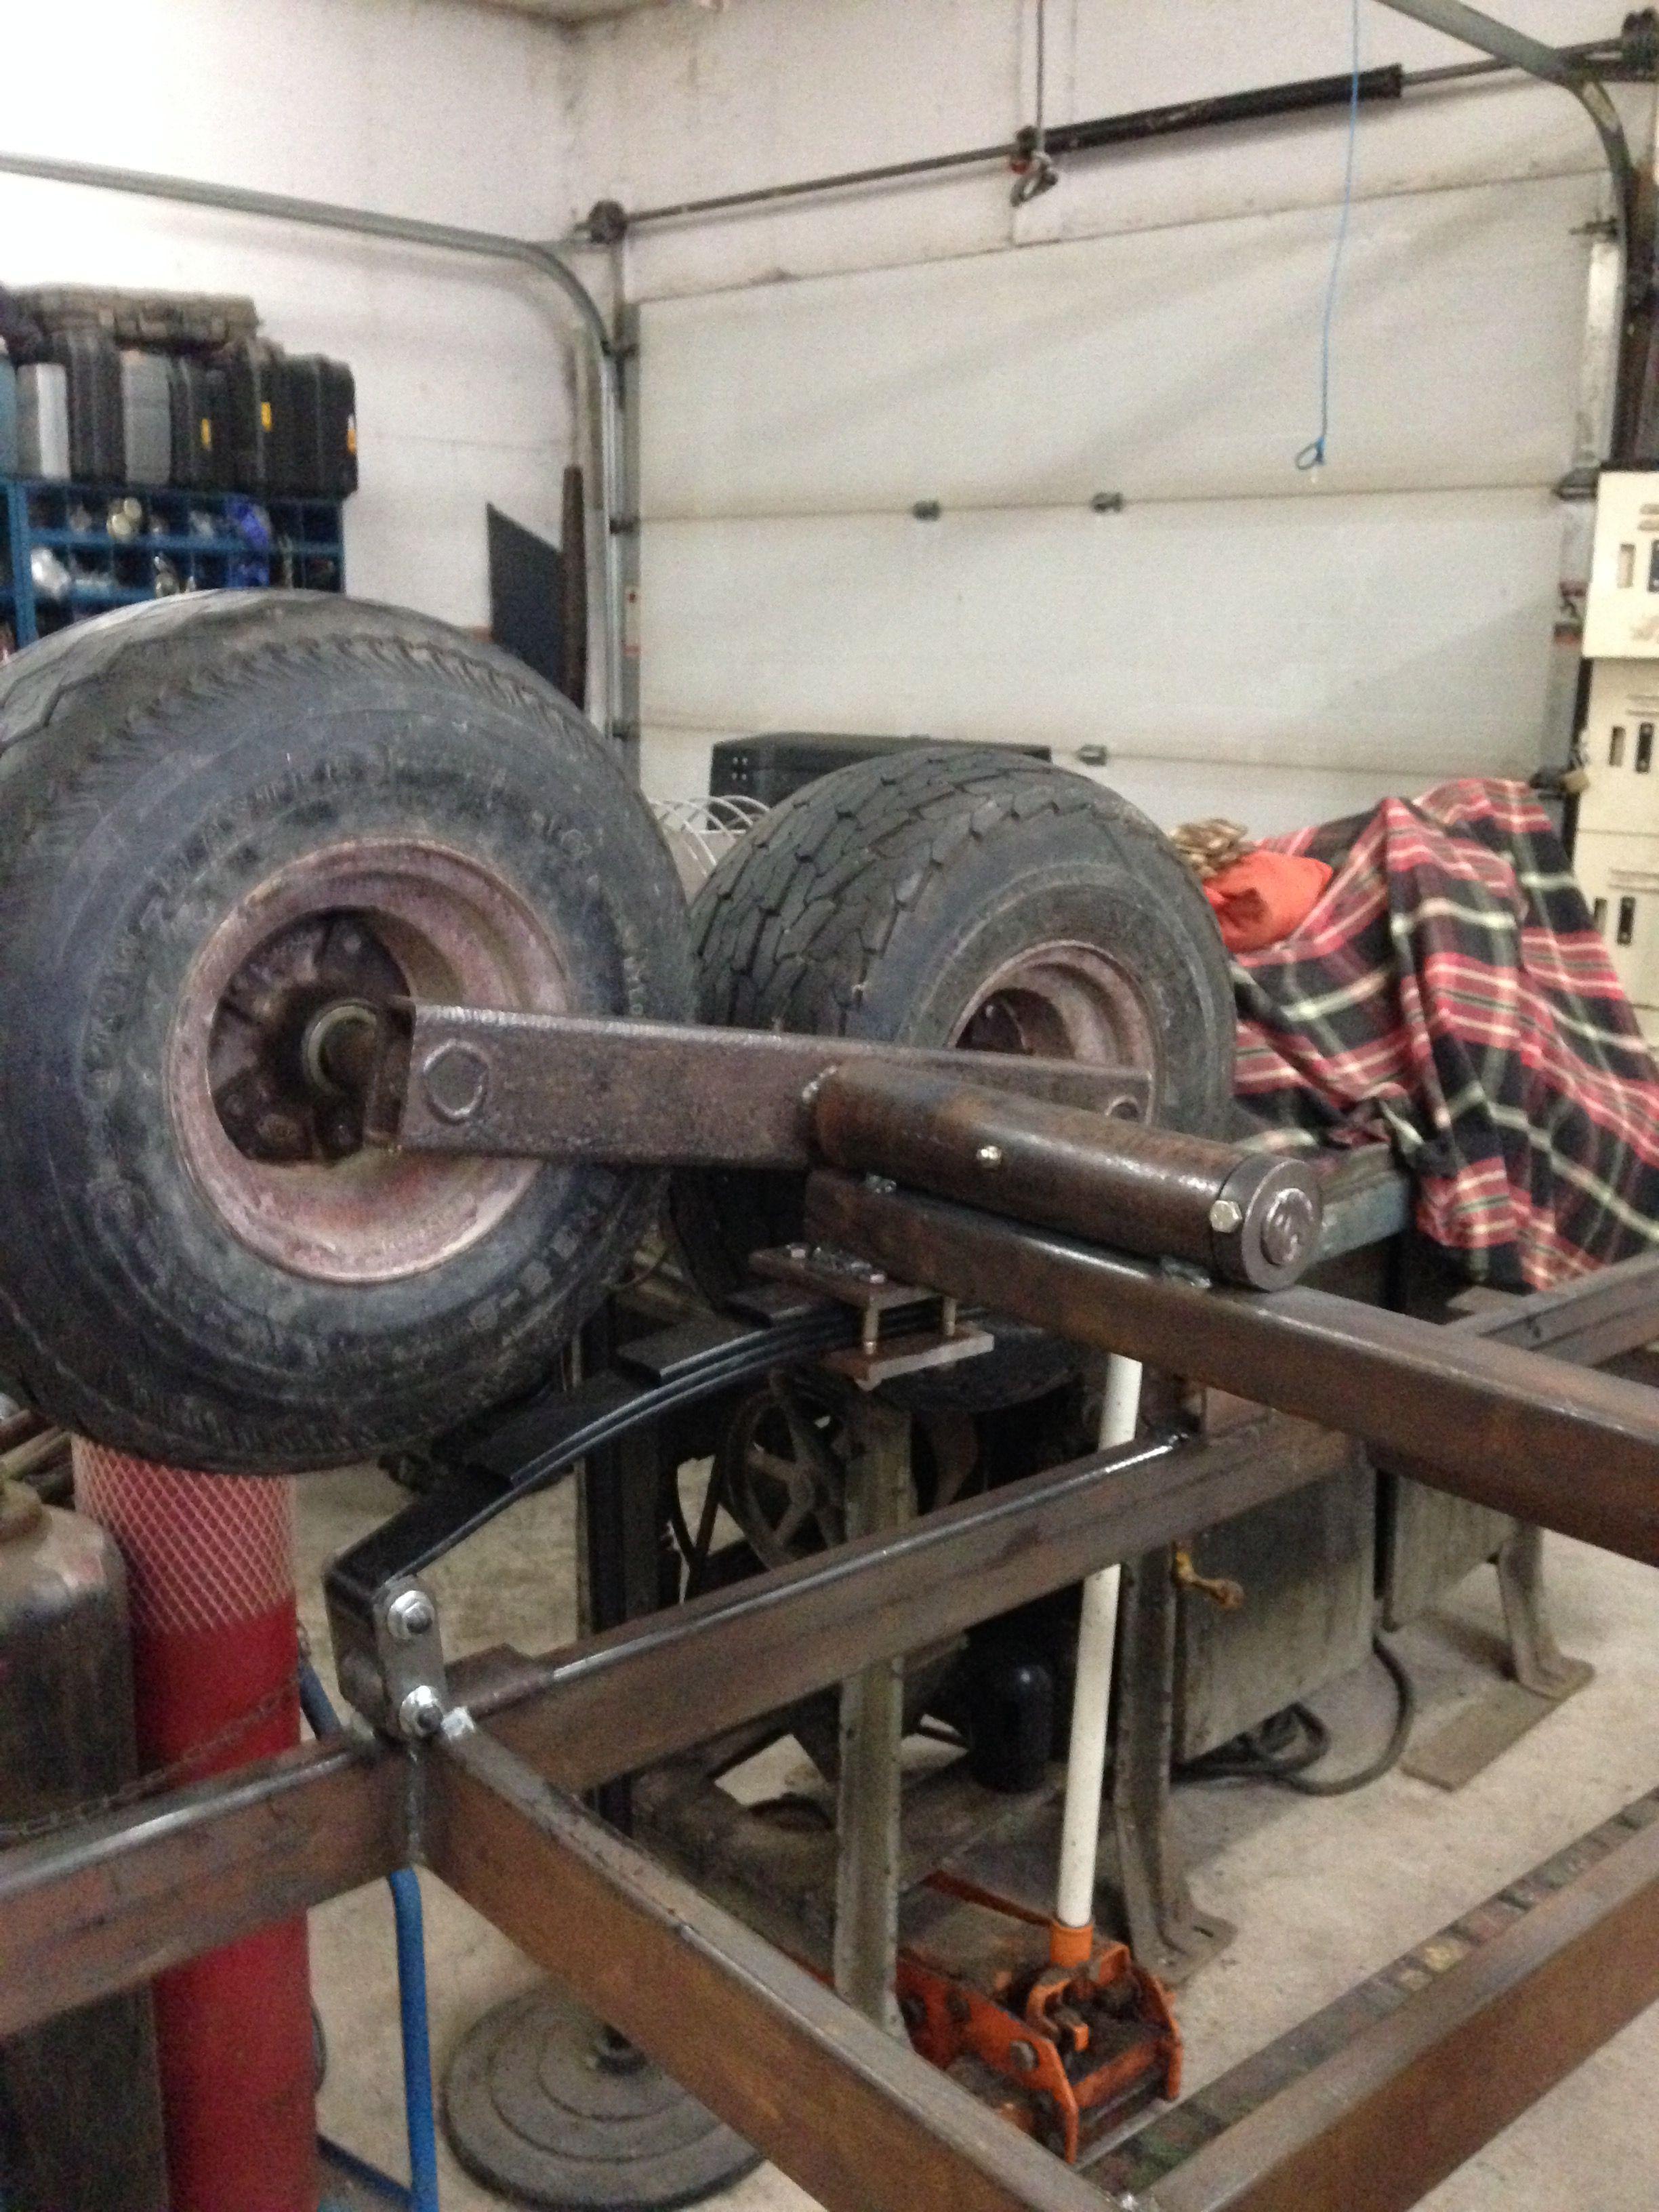 Tandem Axle Walking Beam Offroad In 2018 Pinterest Welding Harbor Freight Camo Atv Winch Wiring Diagram Beams Tractors Garage